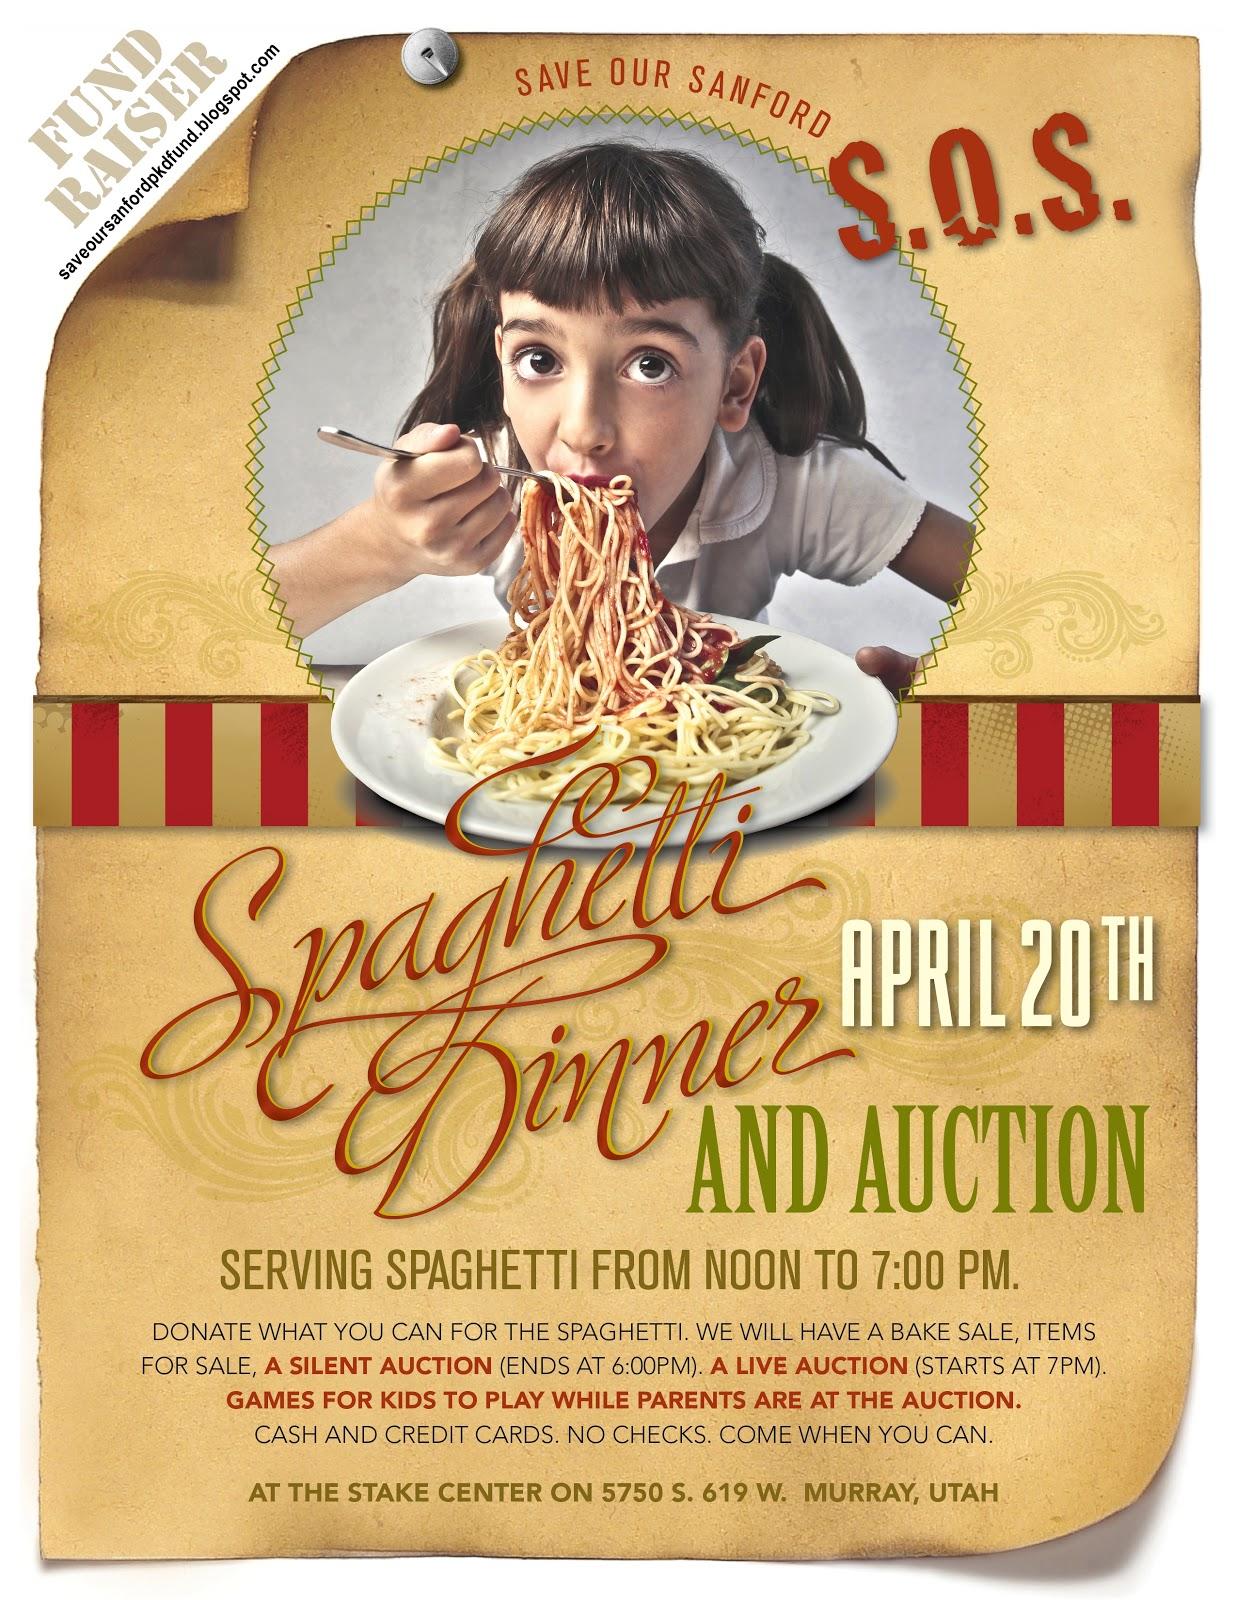 s o s save our sanford pkd fund spaghetti dinner auction flyer